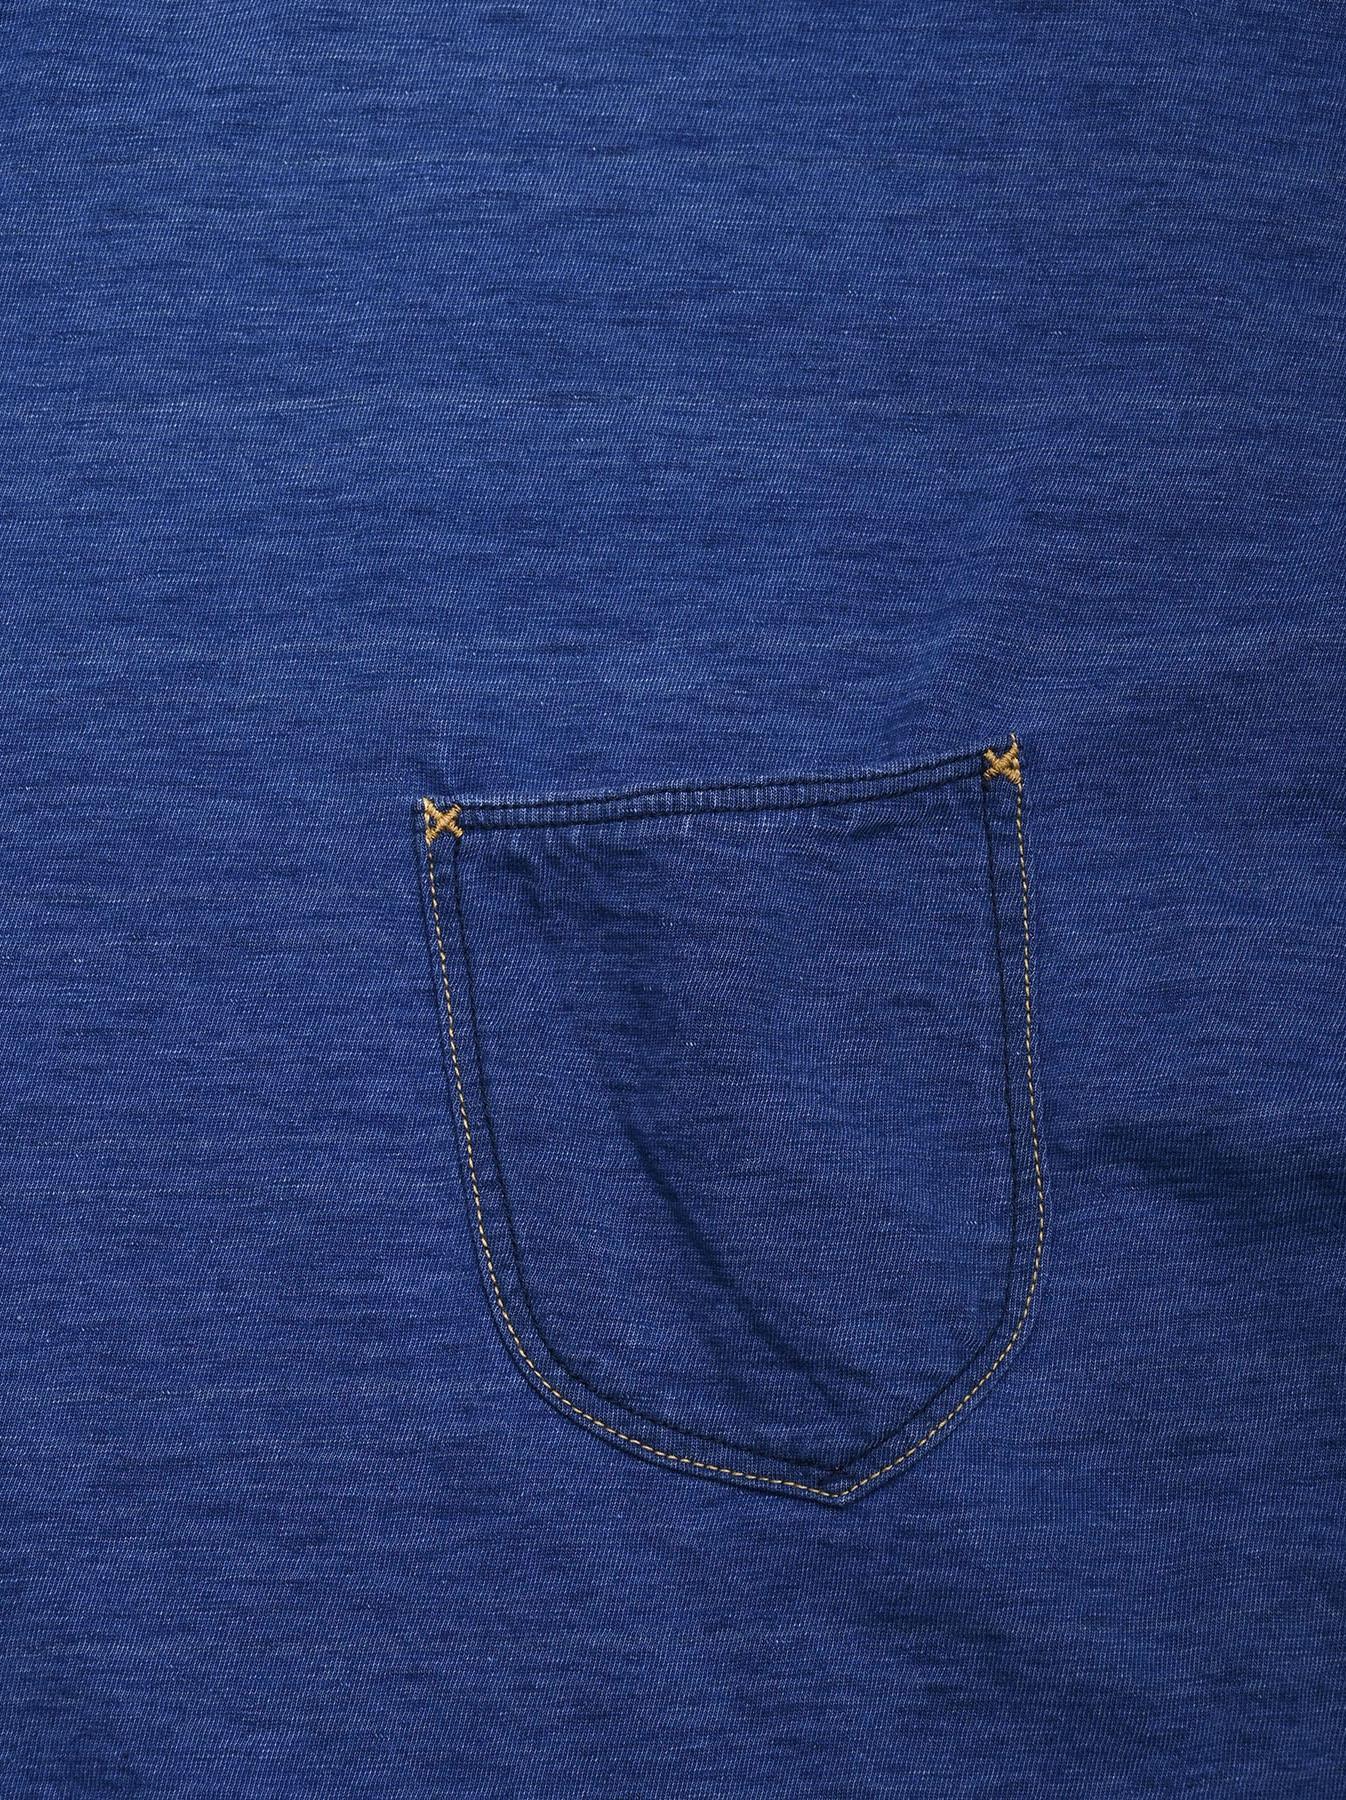 Distressed Indigo Tenjiku 908 Ocean T-Shirt (0621)-7